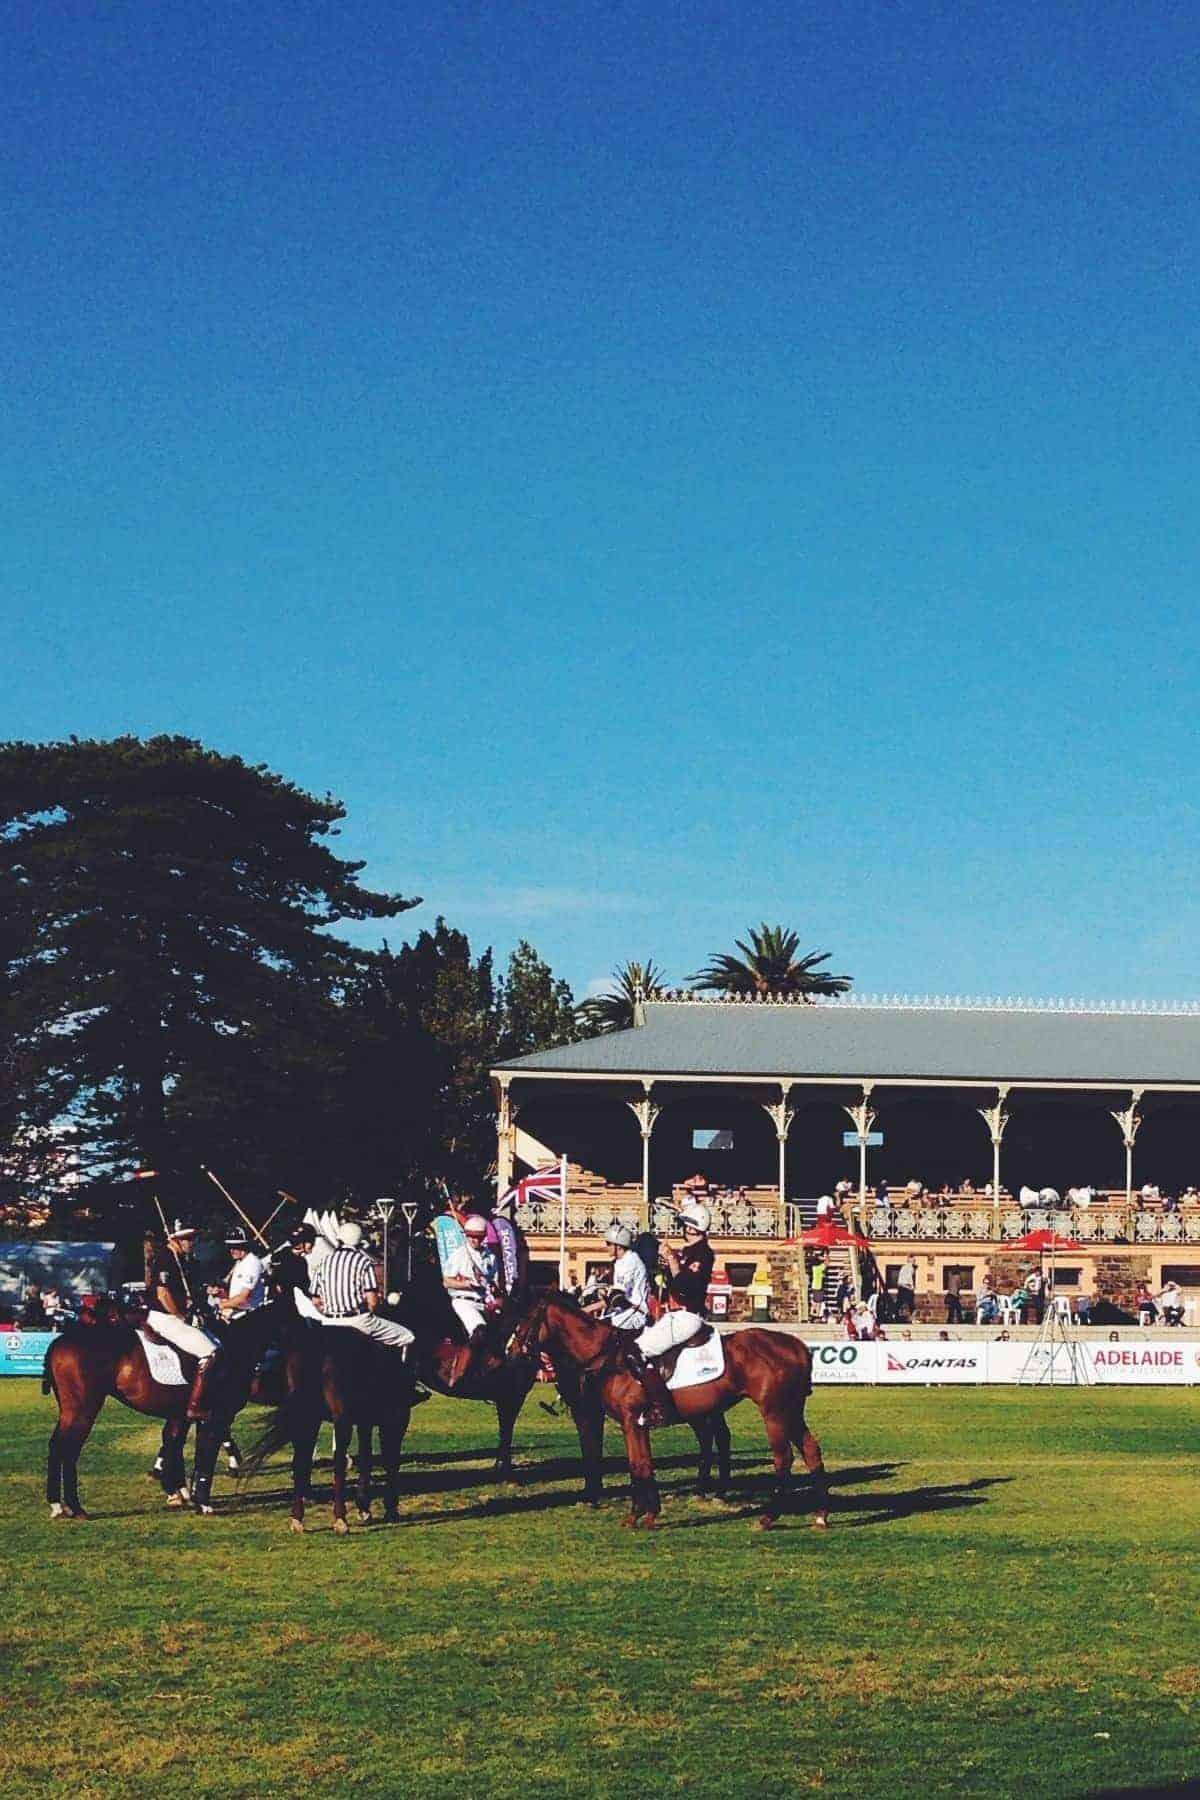 polo match Adelaide